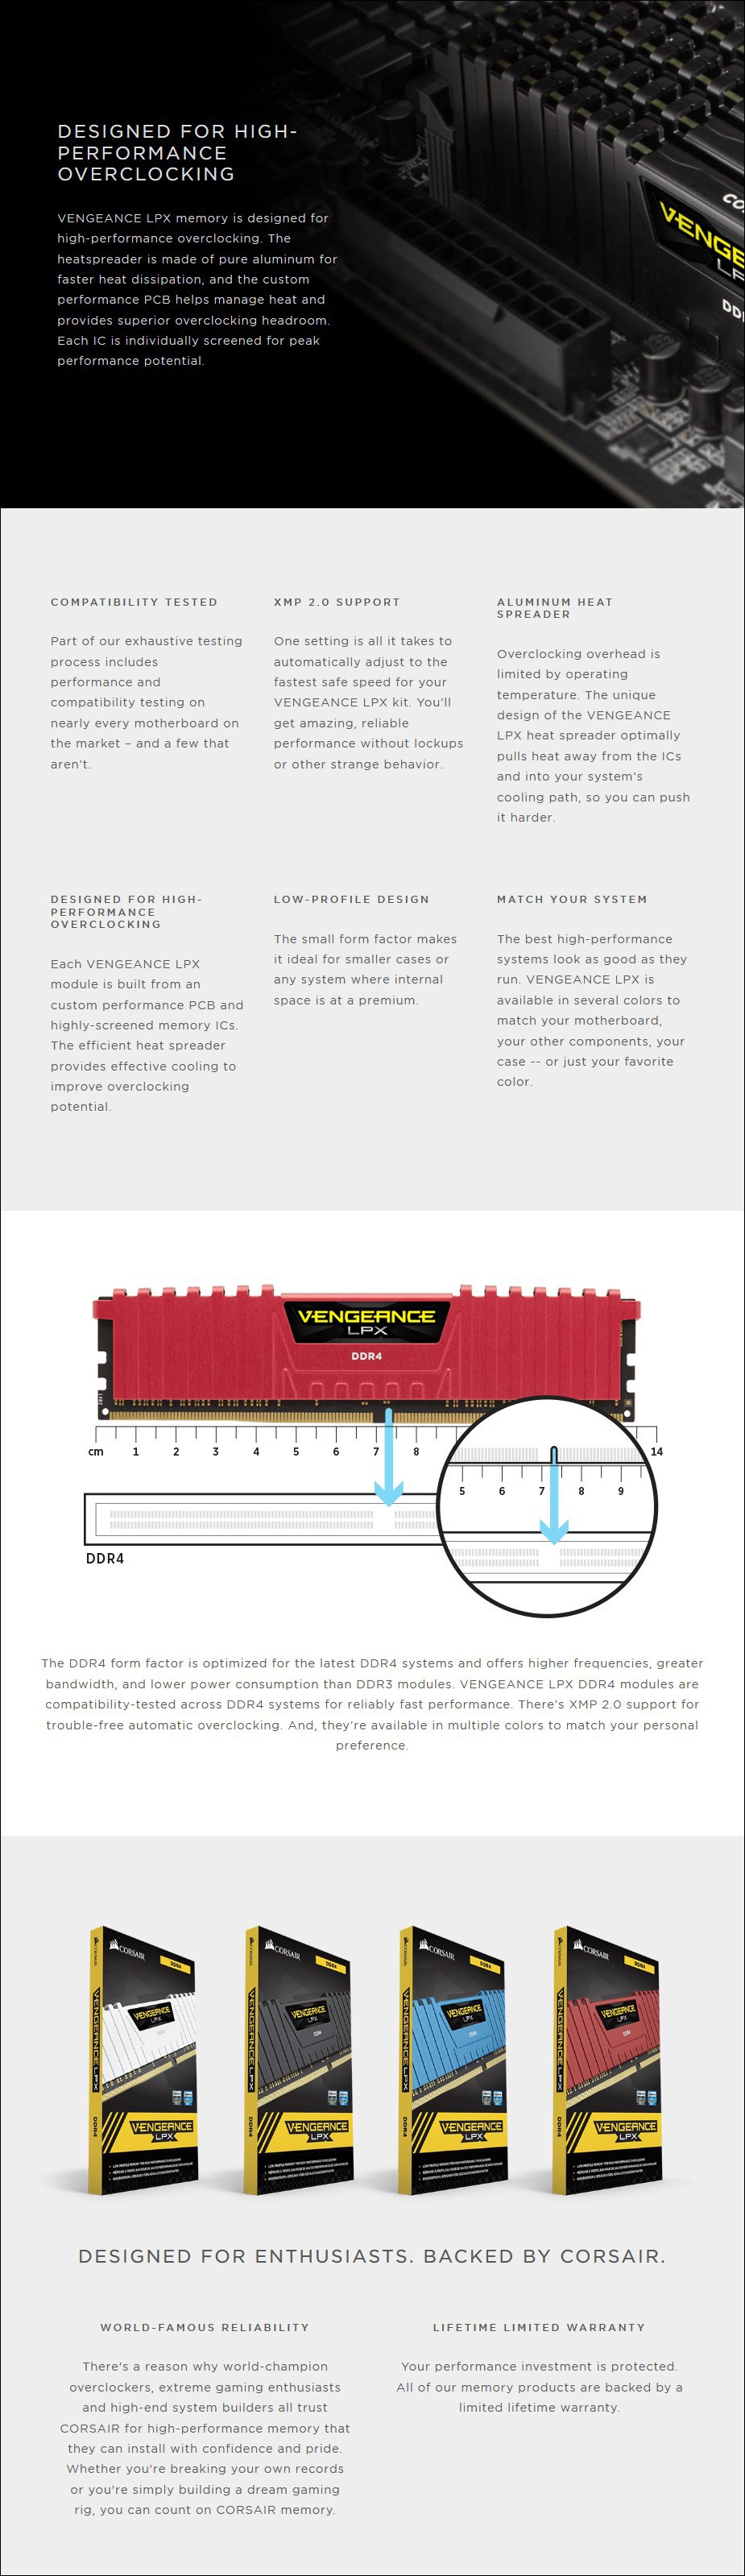 Corsair Vengeance LPX 16GB (2x 8GB) DDR4 3600MHz C19 Memory - Black - Overview 1